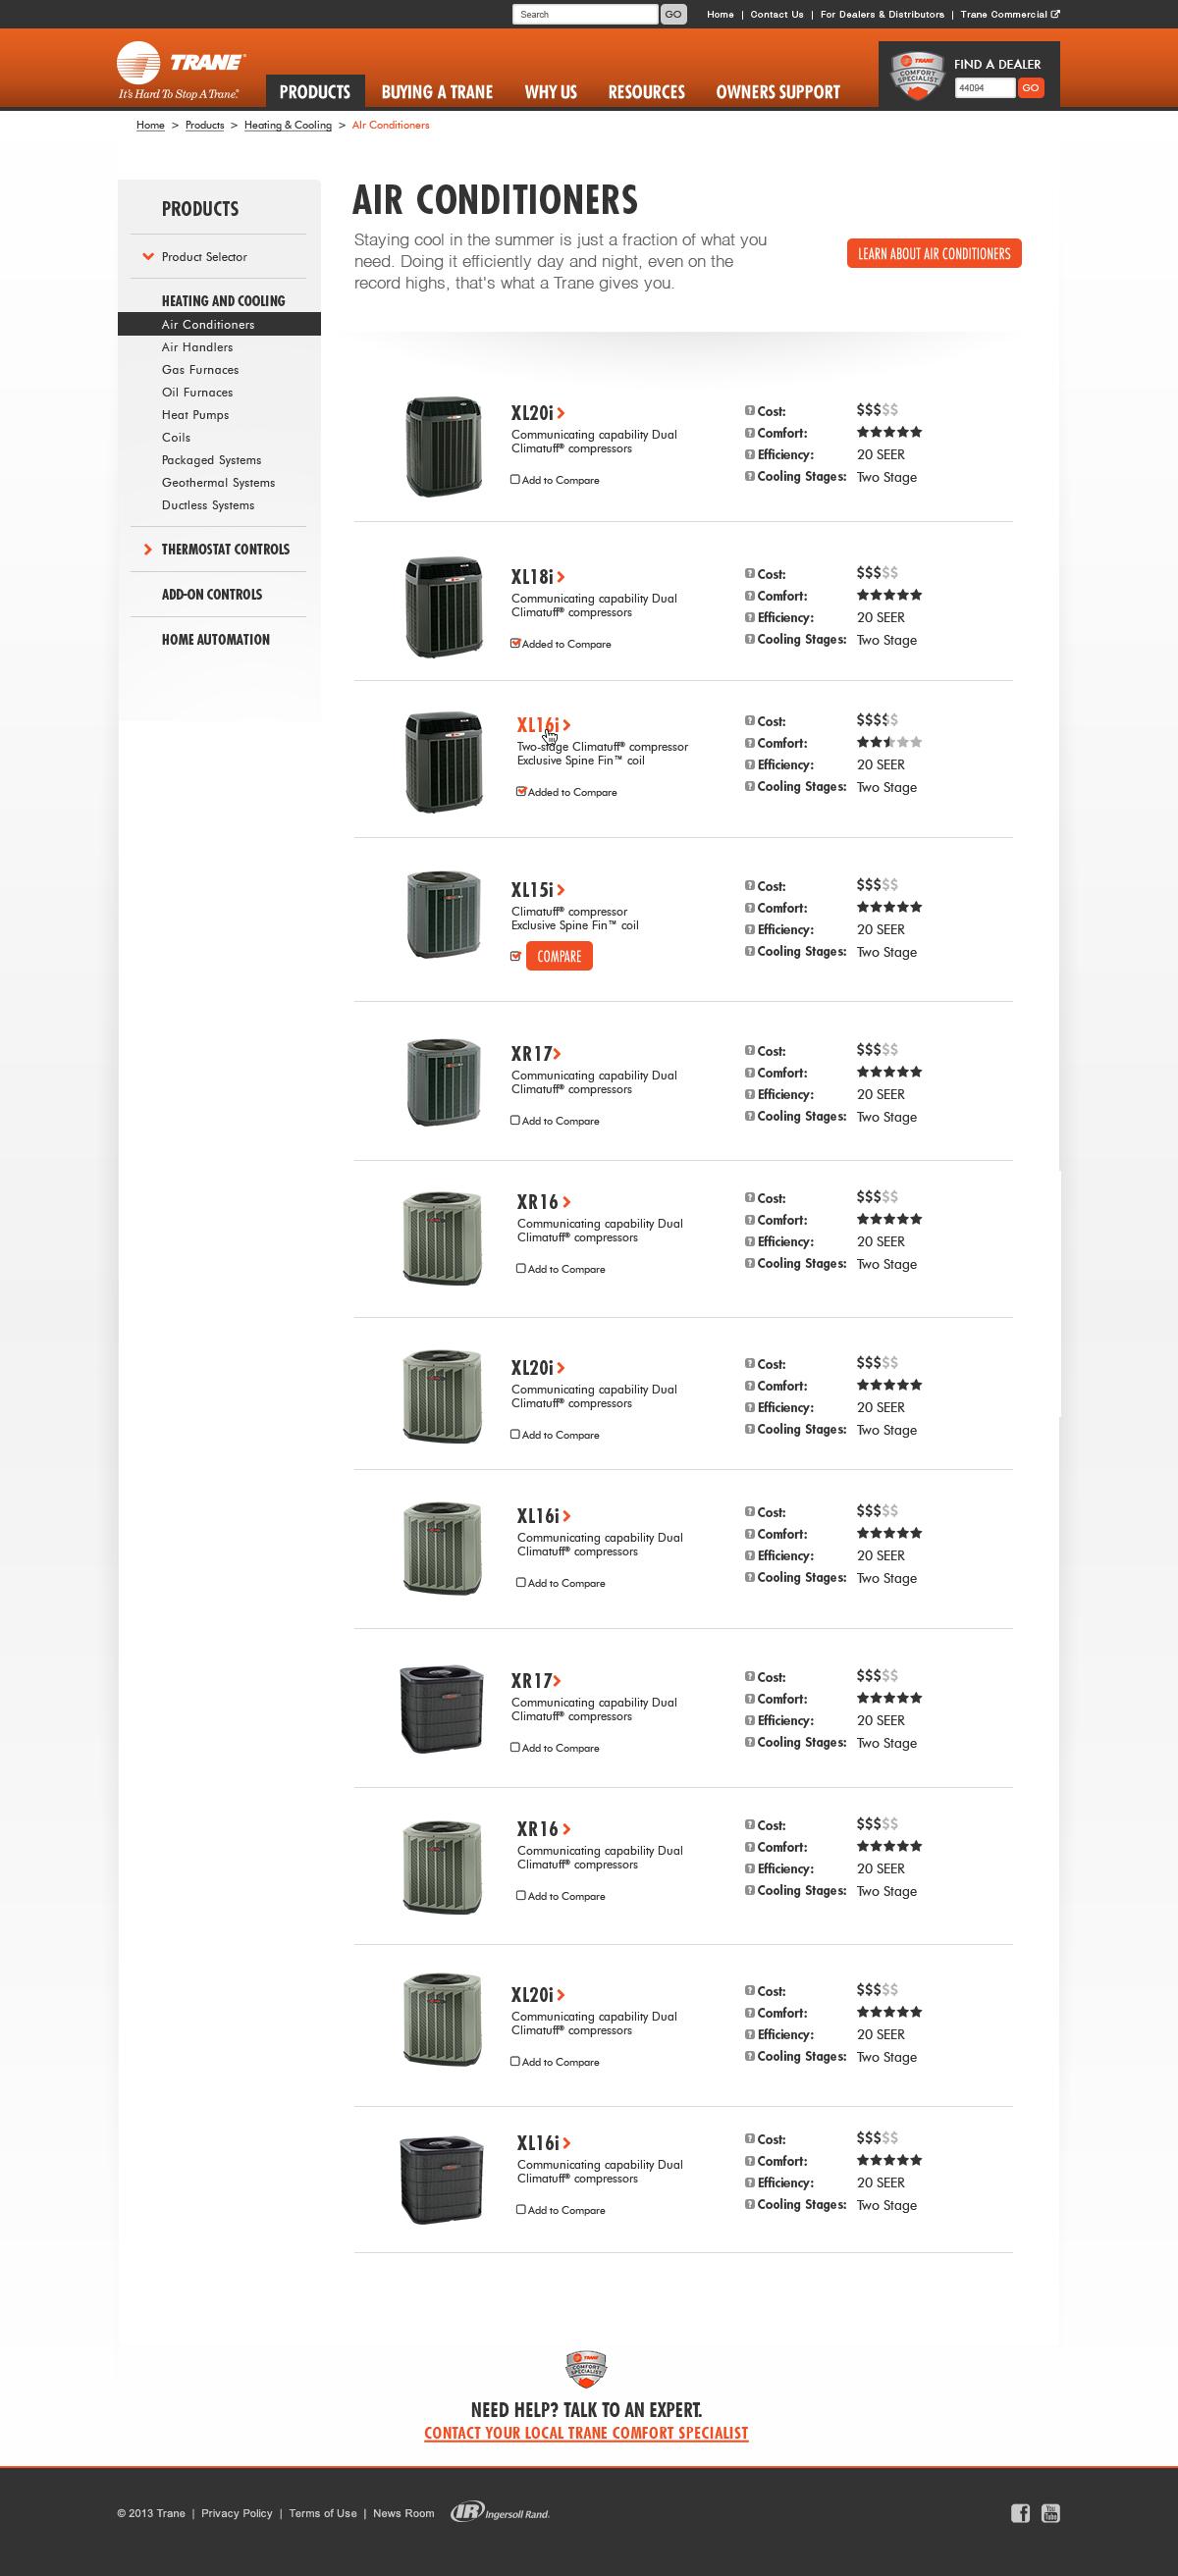 Trane-Product-List.jpg